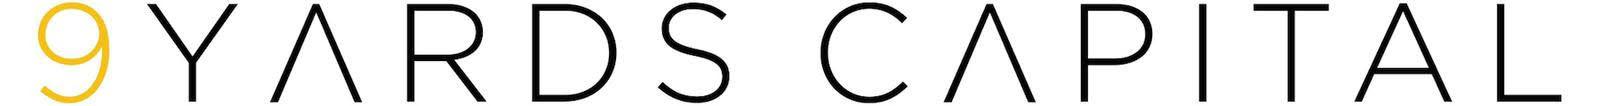 9yards-logo-website